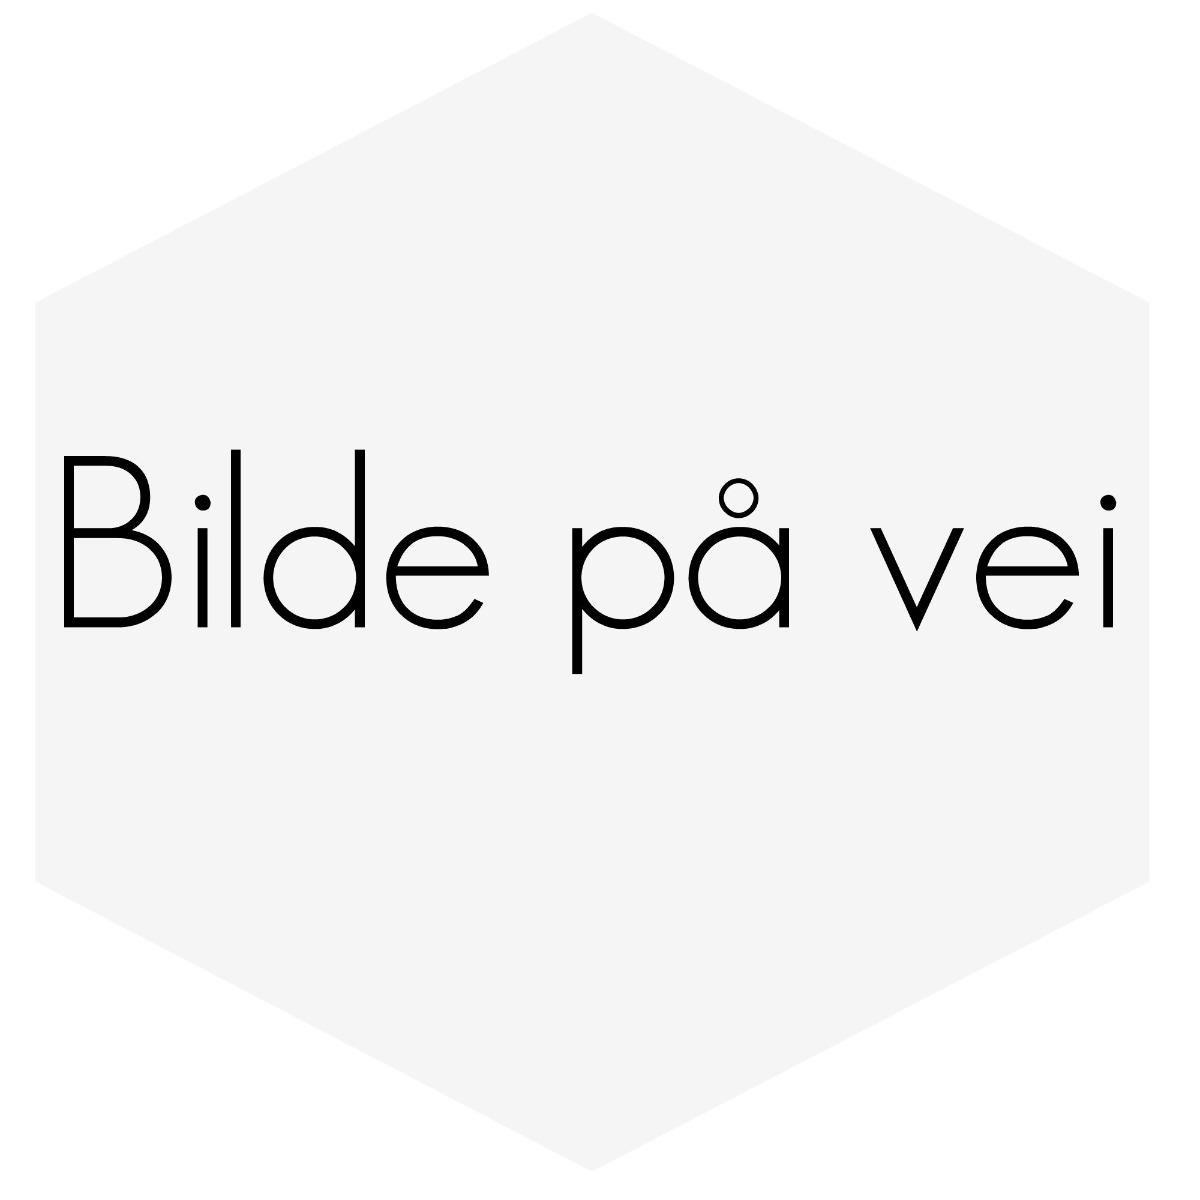 BLINK/PARKGLASS FORAN AMAZON HELVIT HØYRE SIDE